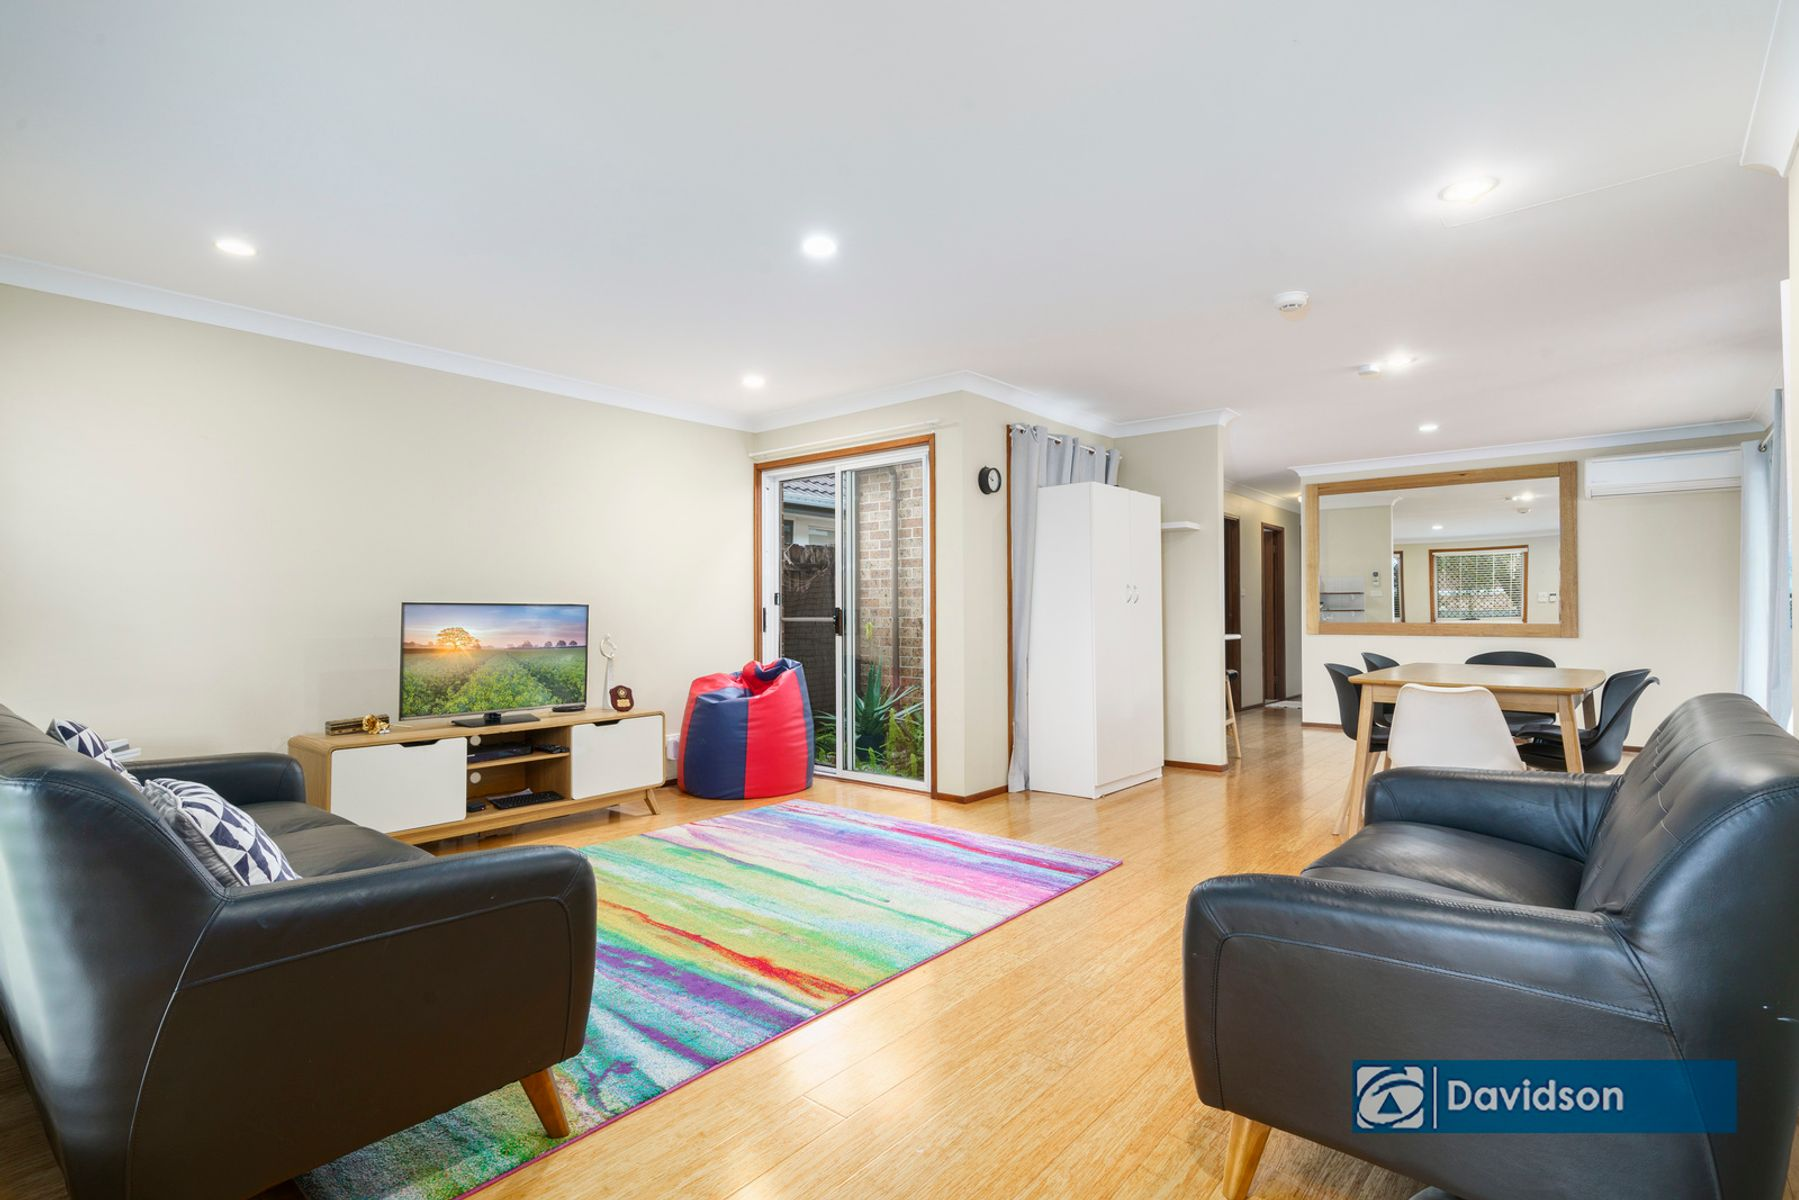 15 Booree Ct, Wattle Grove, NSW 2173